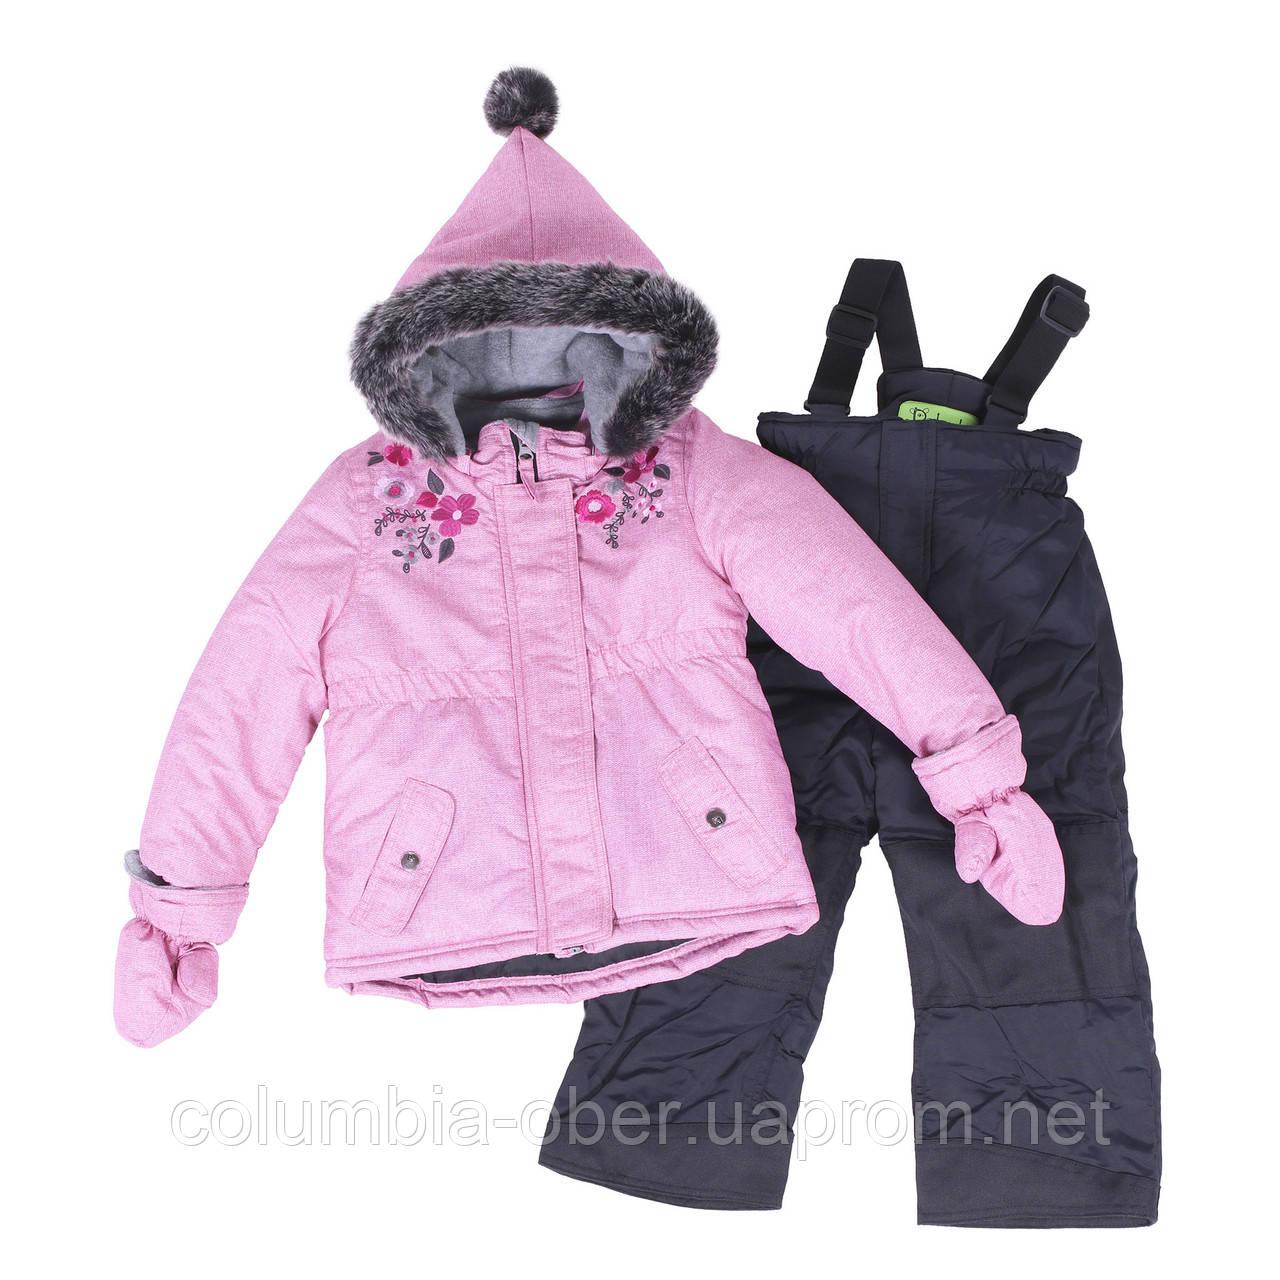 Зимний комплект для девочки PELUCHE F18 M 10 BF Vinage Pink. Размеры 12 мес-3.